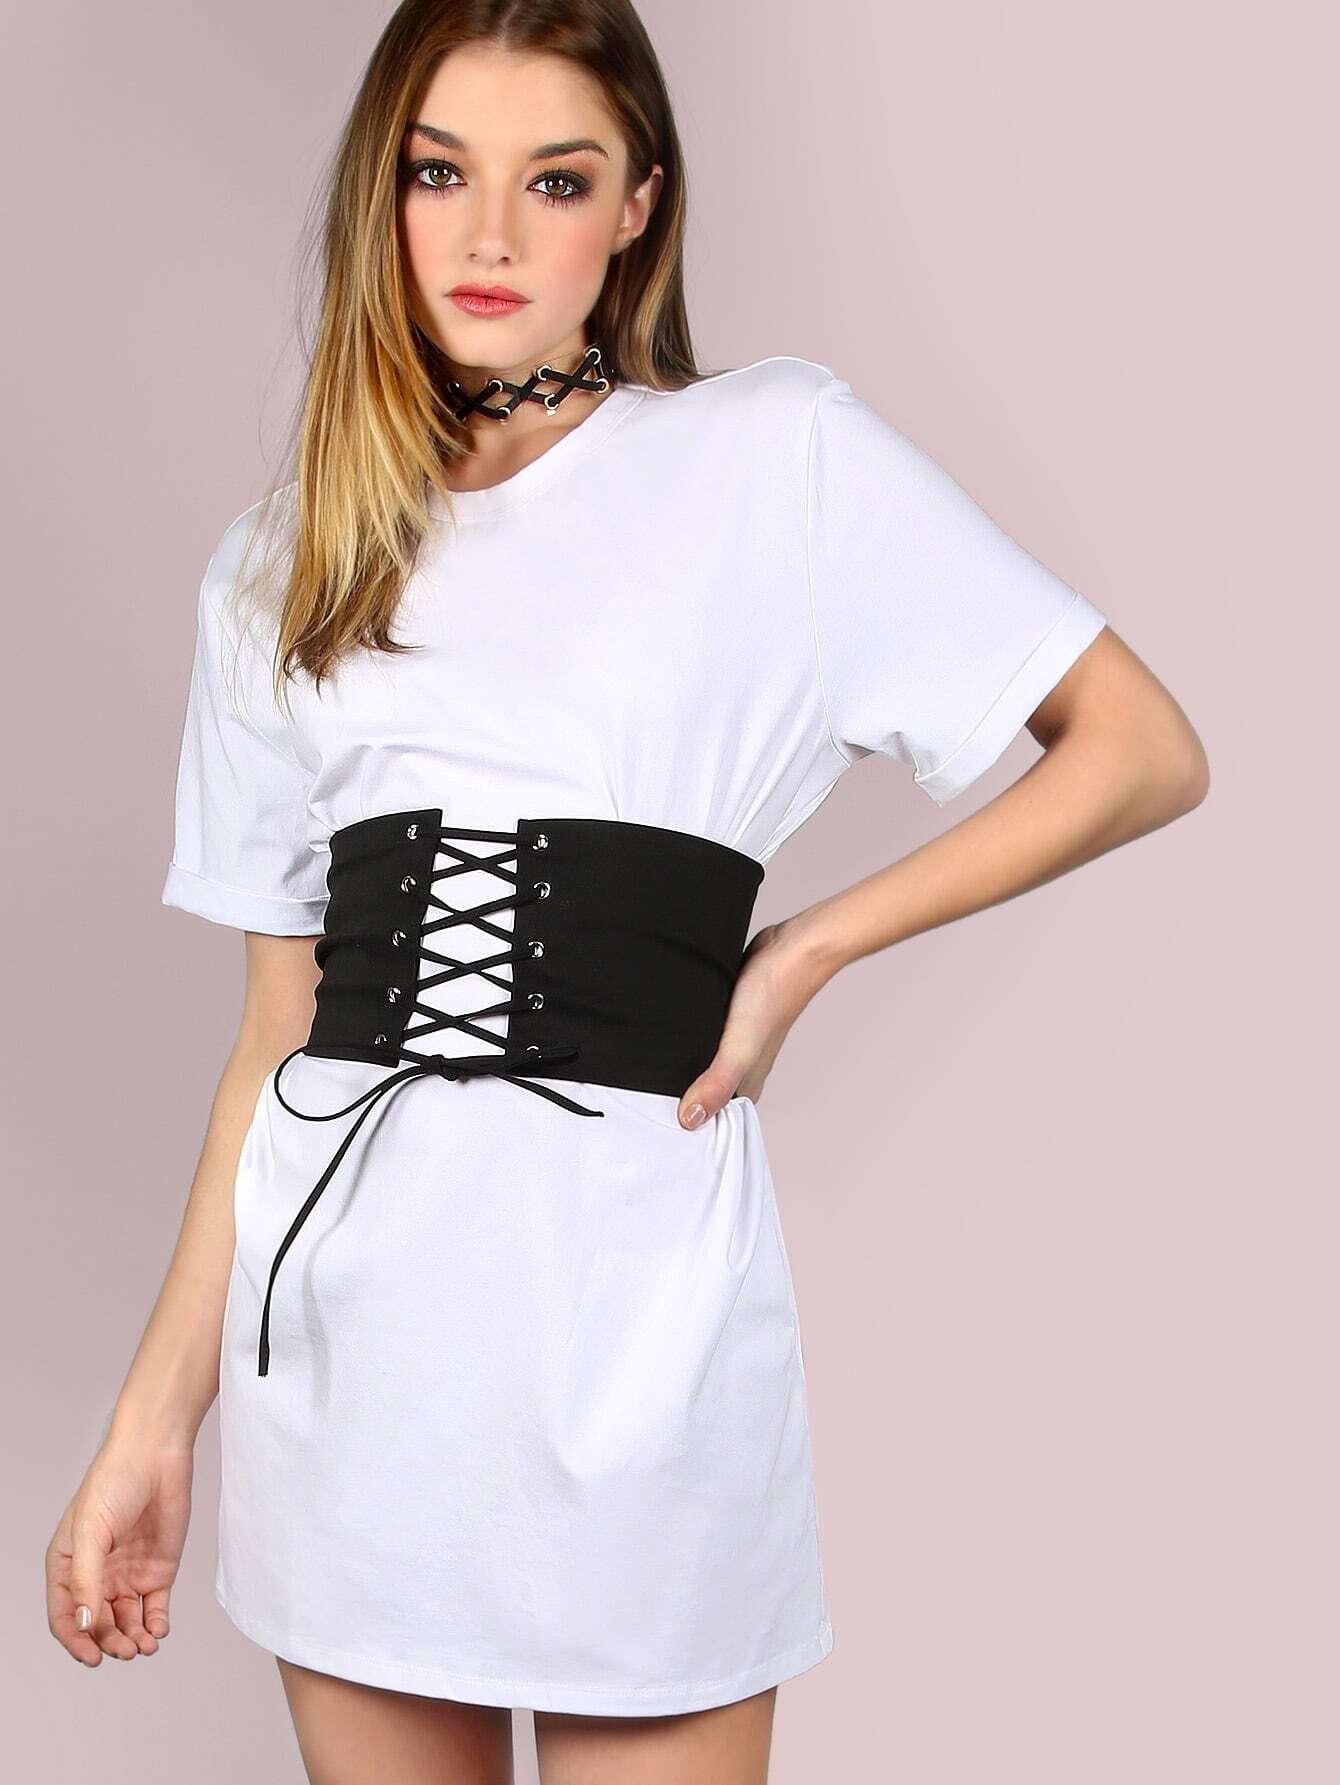 Belted Corset Shirt Dress White Emmacloth Women Fast Fashion Online